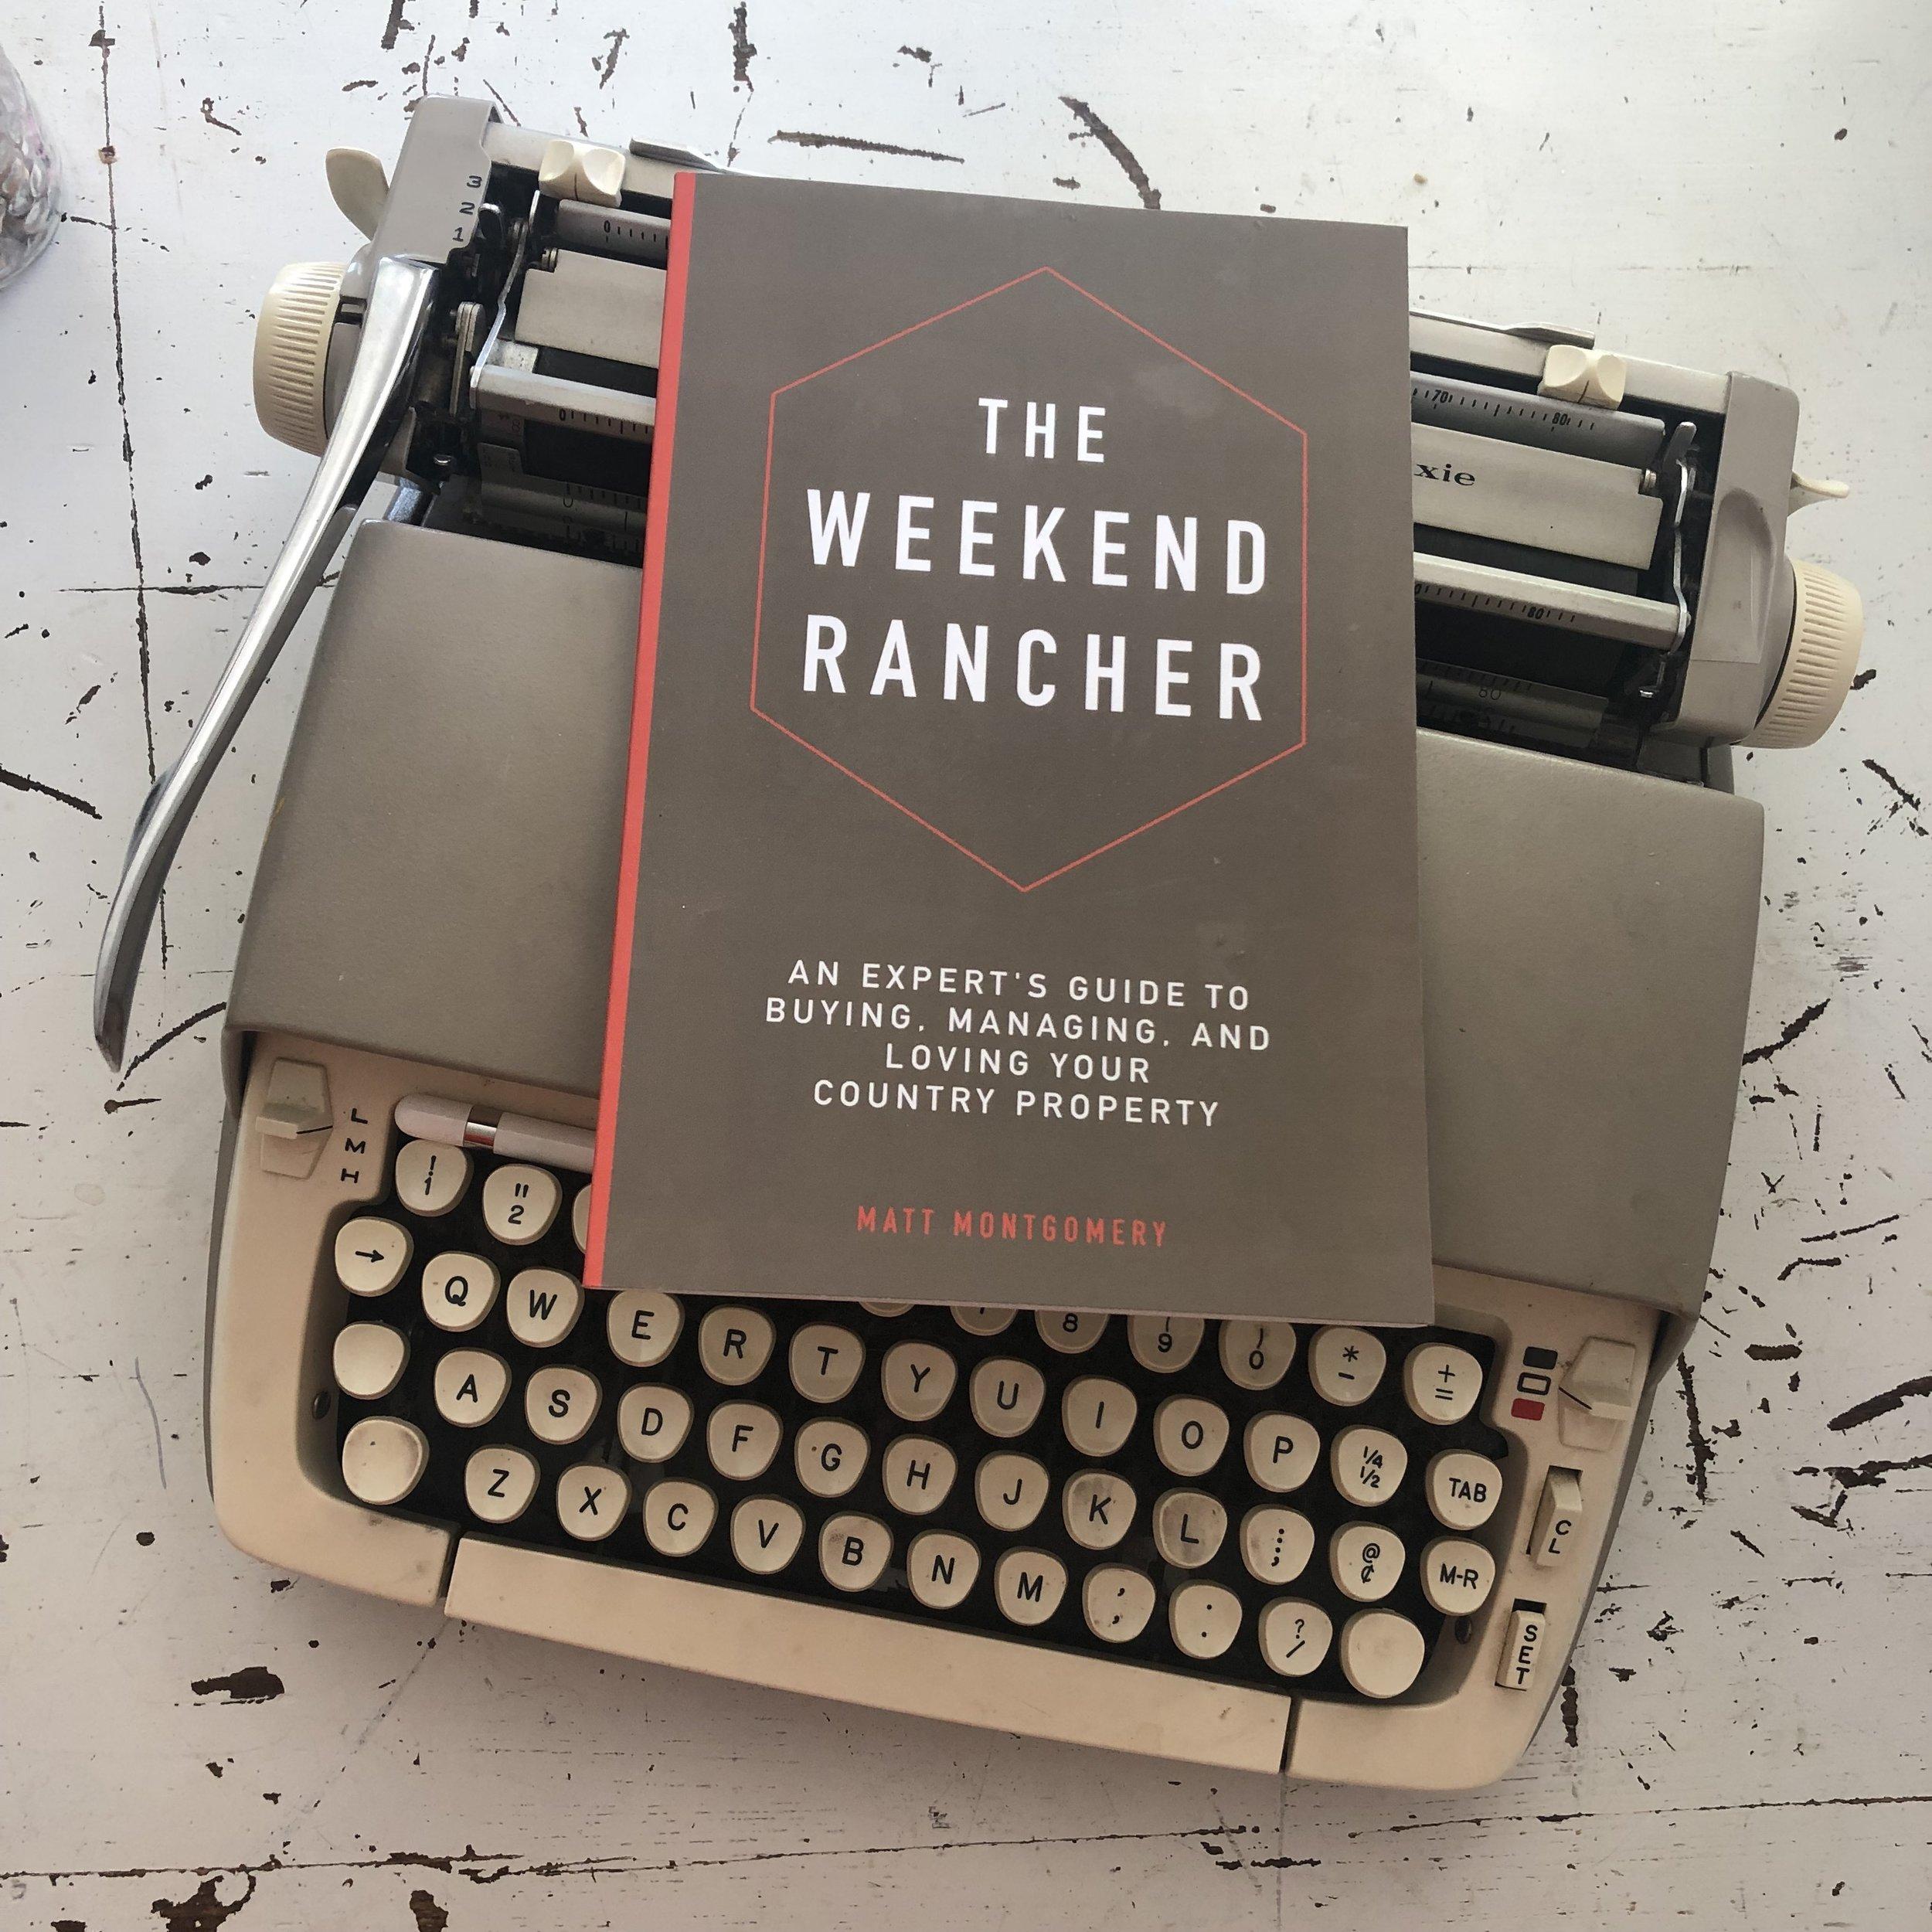 weekend rancher.JPG